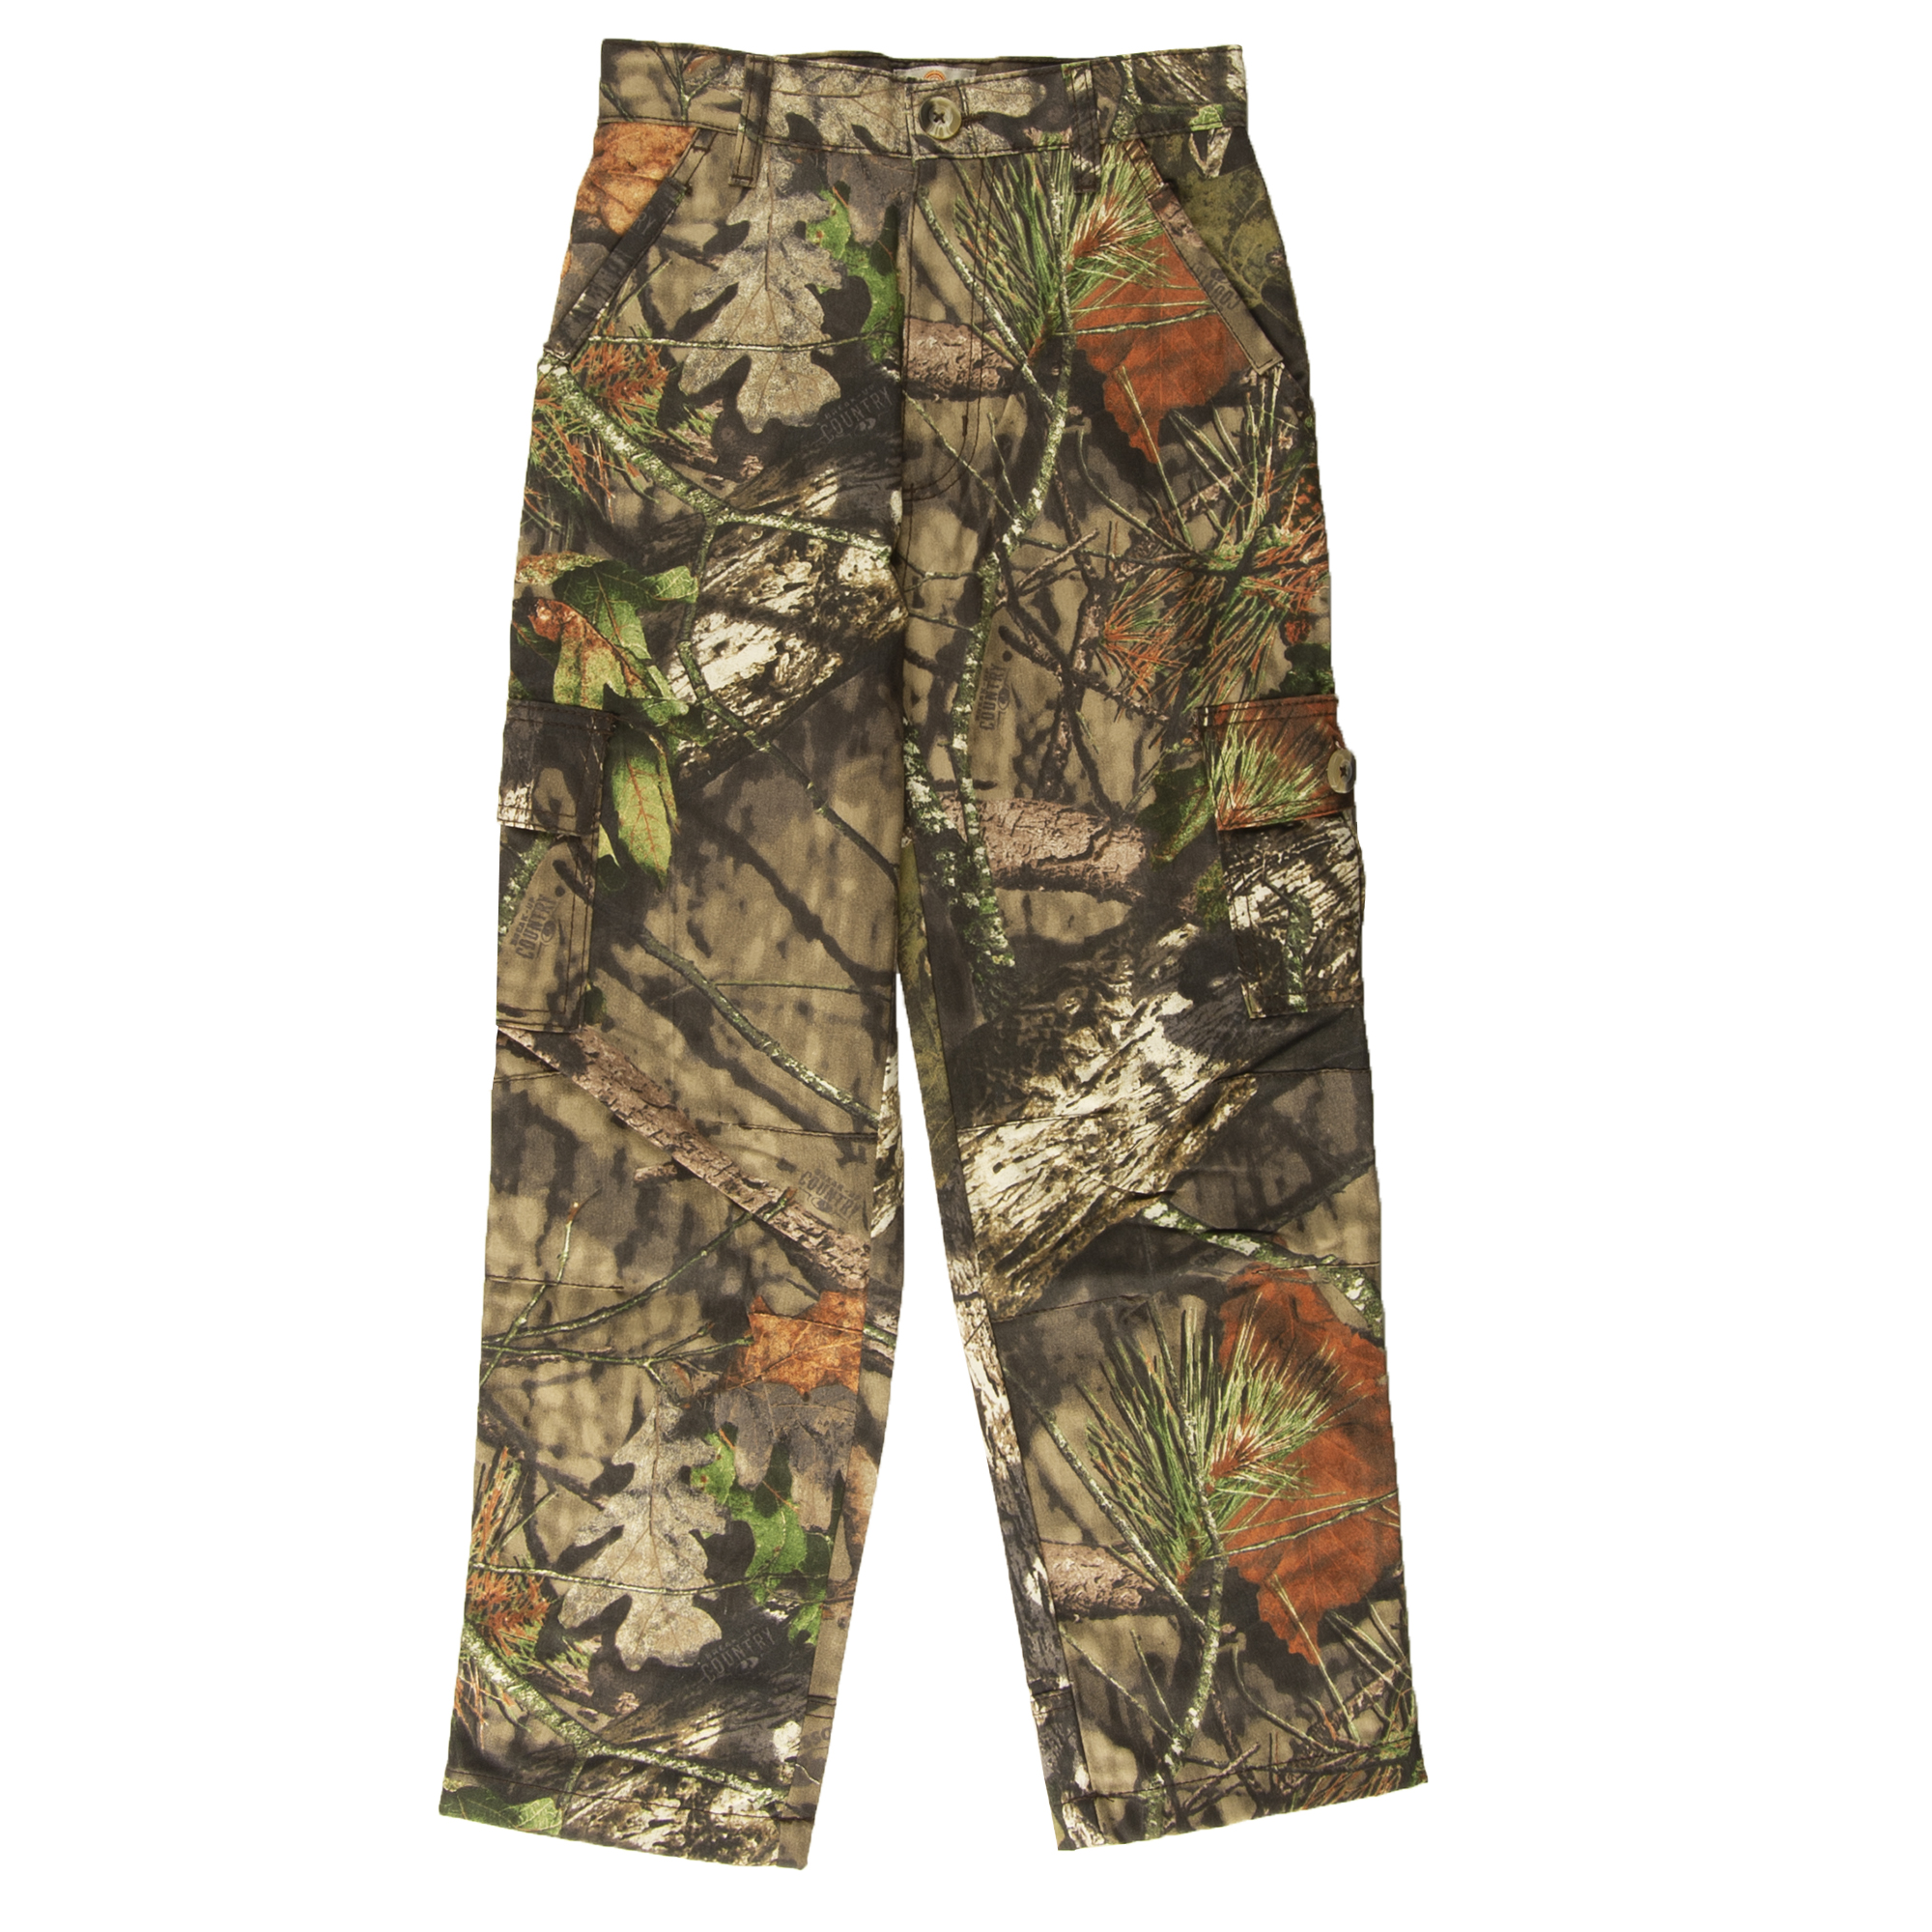 Hunter's Choice Youth Camo Six-Pocket Pant, Mossy Oak Break-Up Country